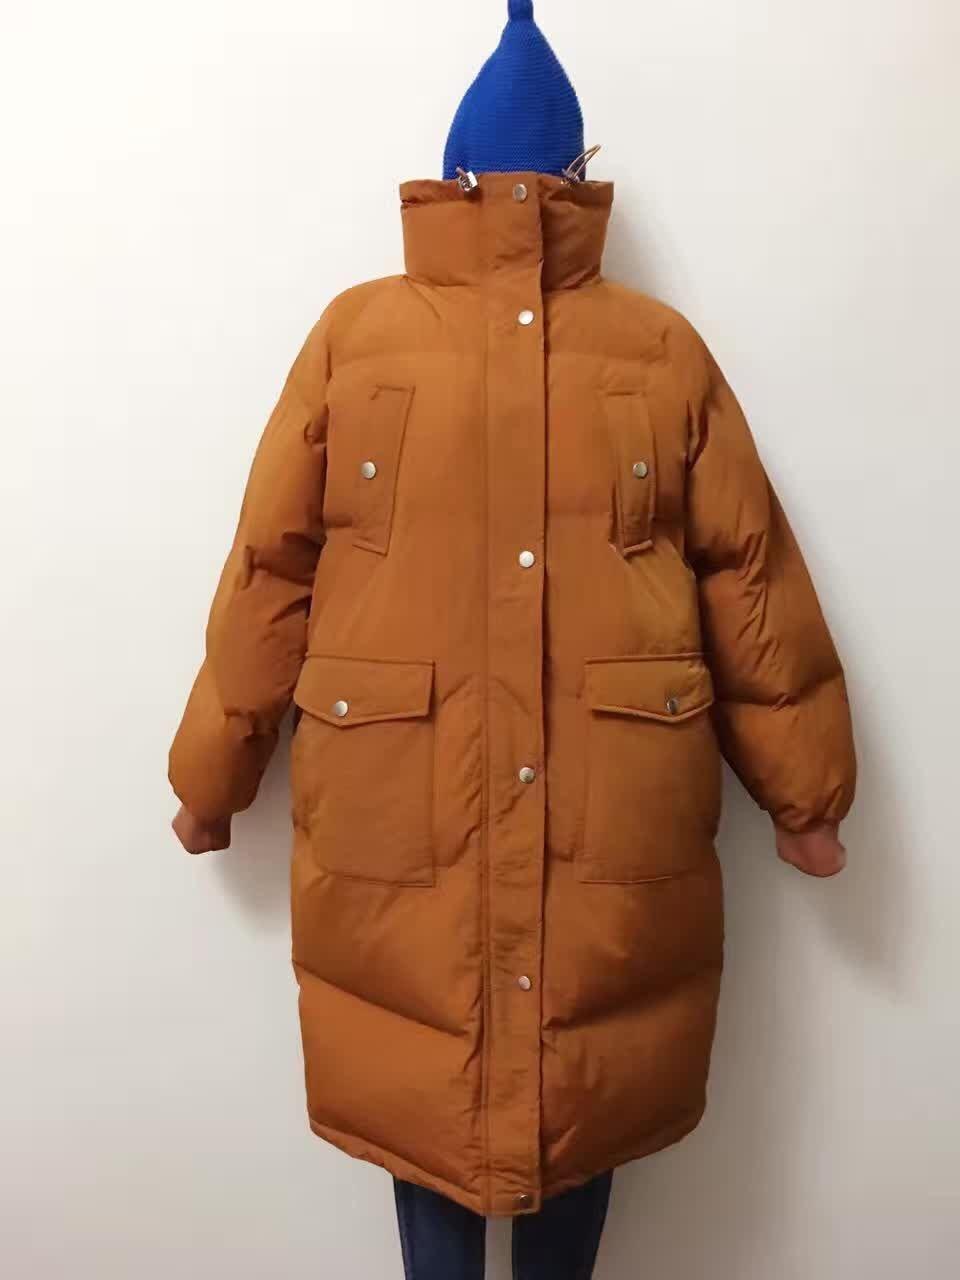 Plus size winter wadded jacket thickening cotton-padded jacket outerwear cotton-padded jacket female medium-long bread service